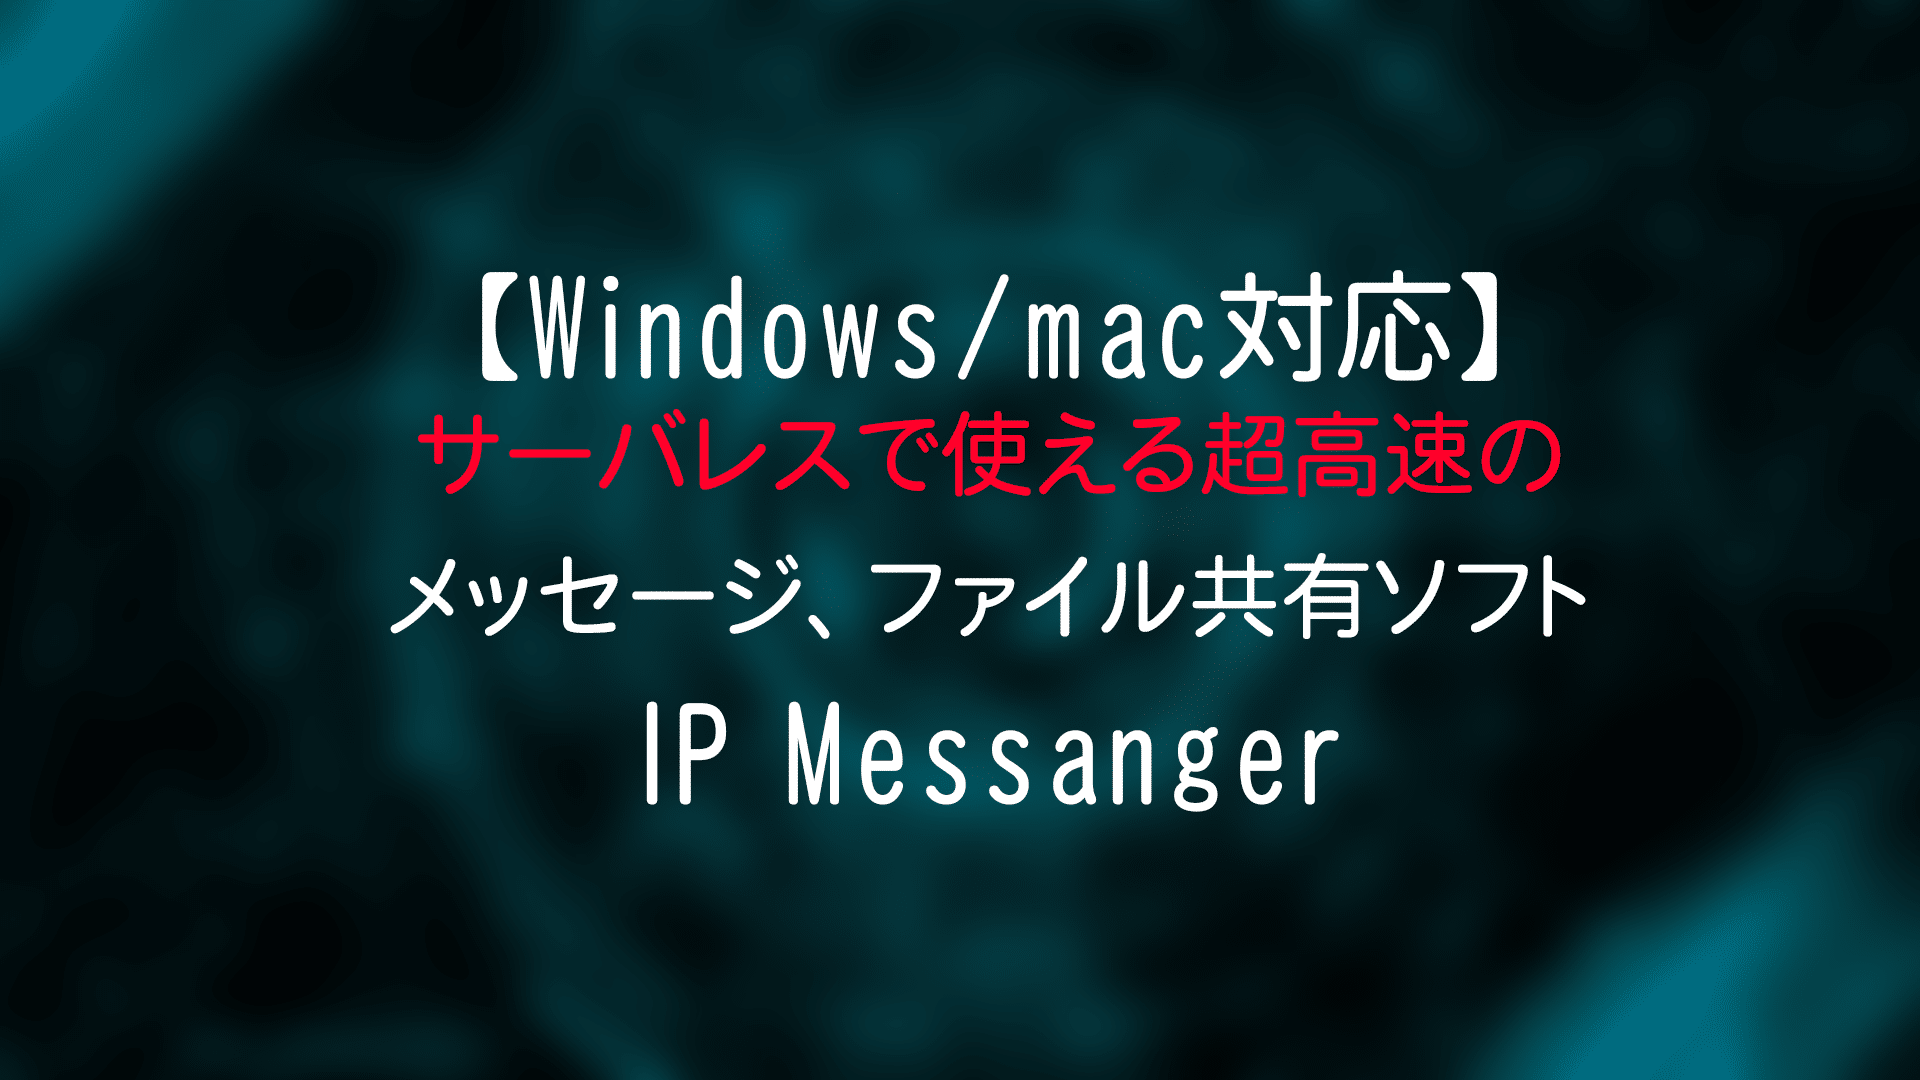 ipmessanger - 【Windows/mac対応】 サーバレスで使える超高速の メッセージ、ファイル共有ソフト IP Messanger